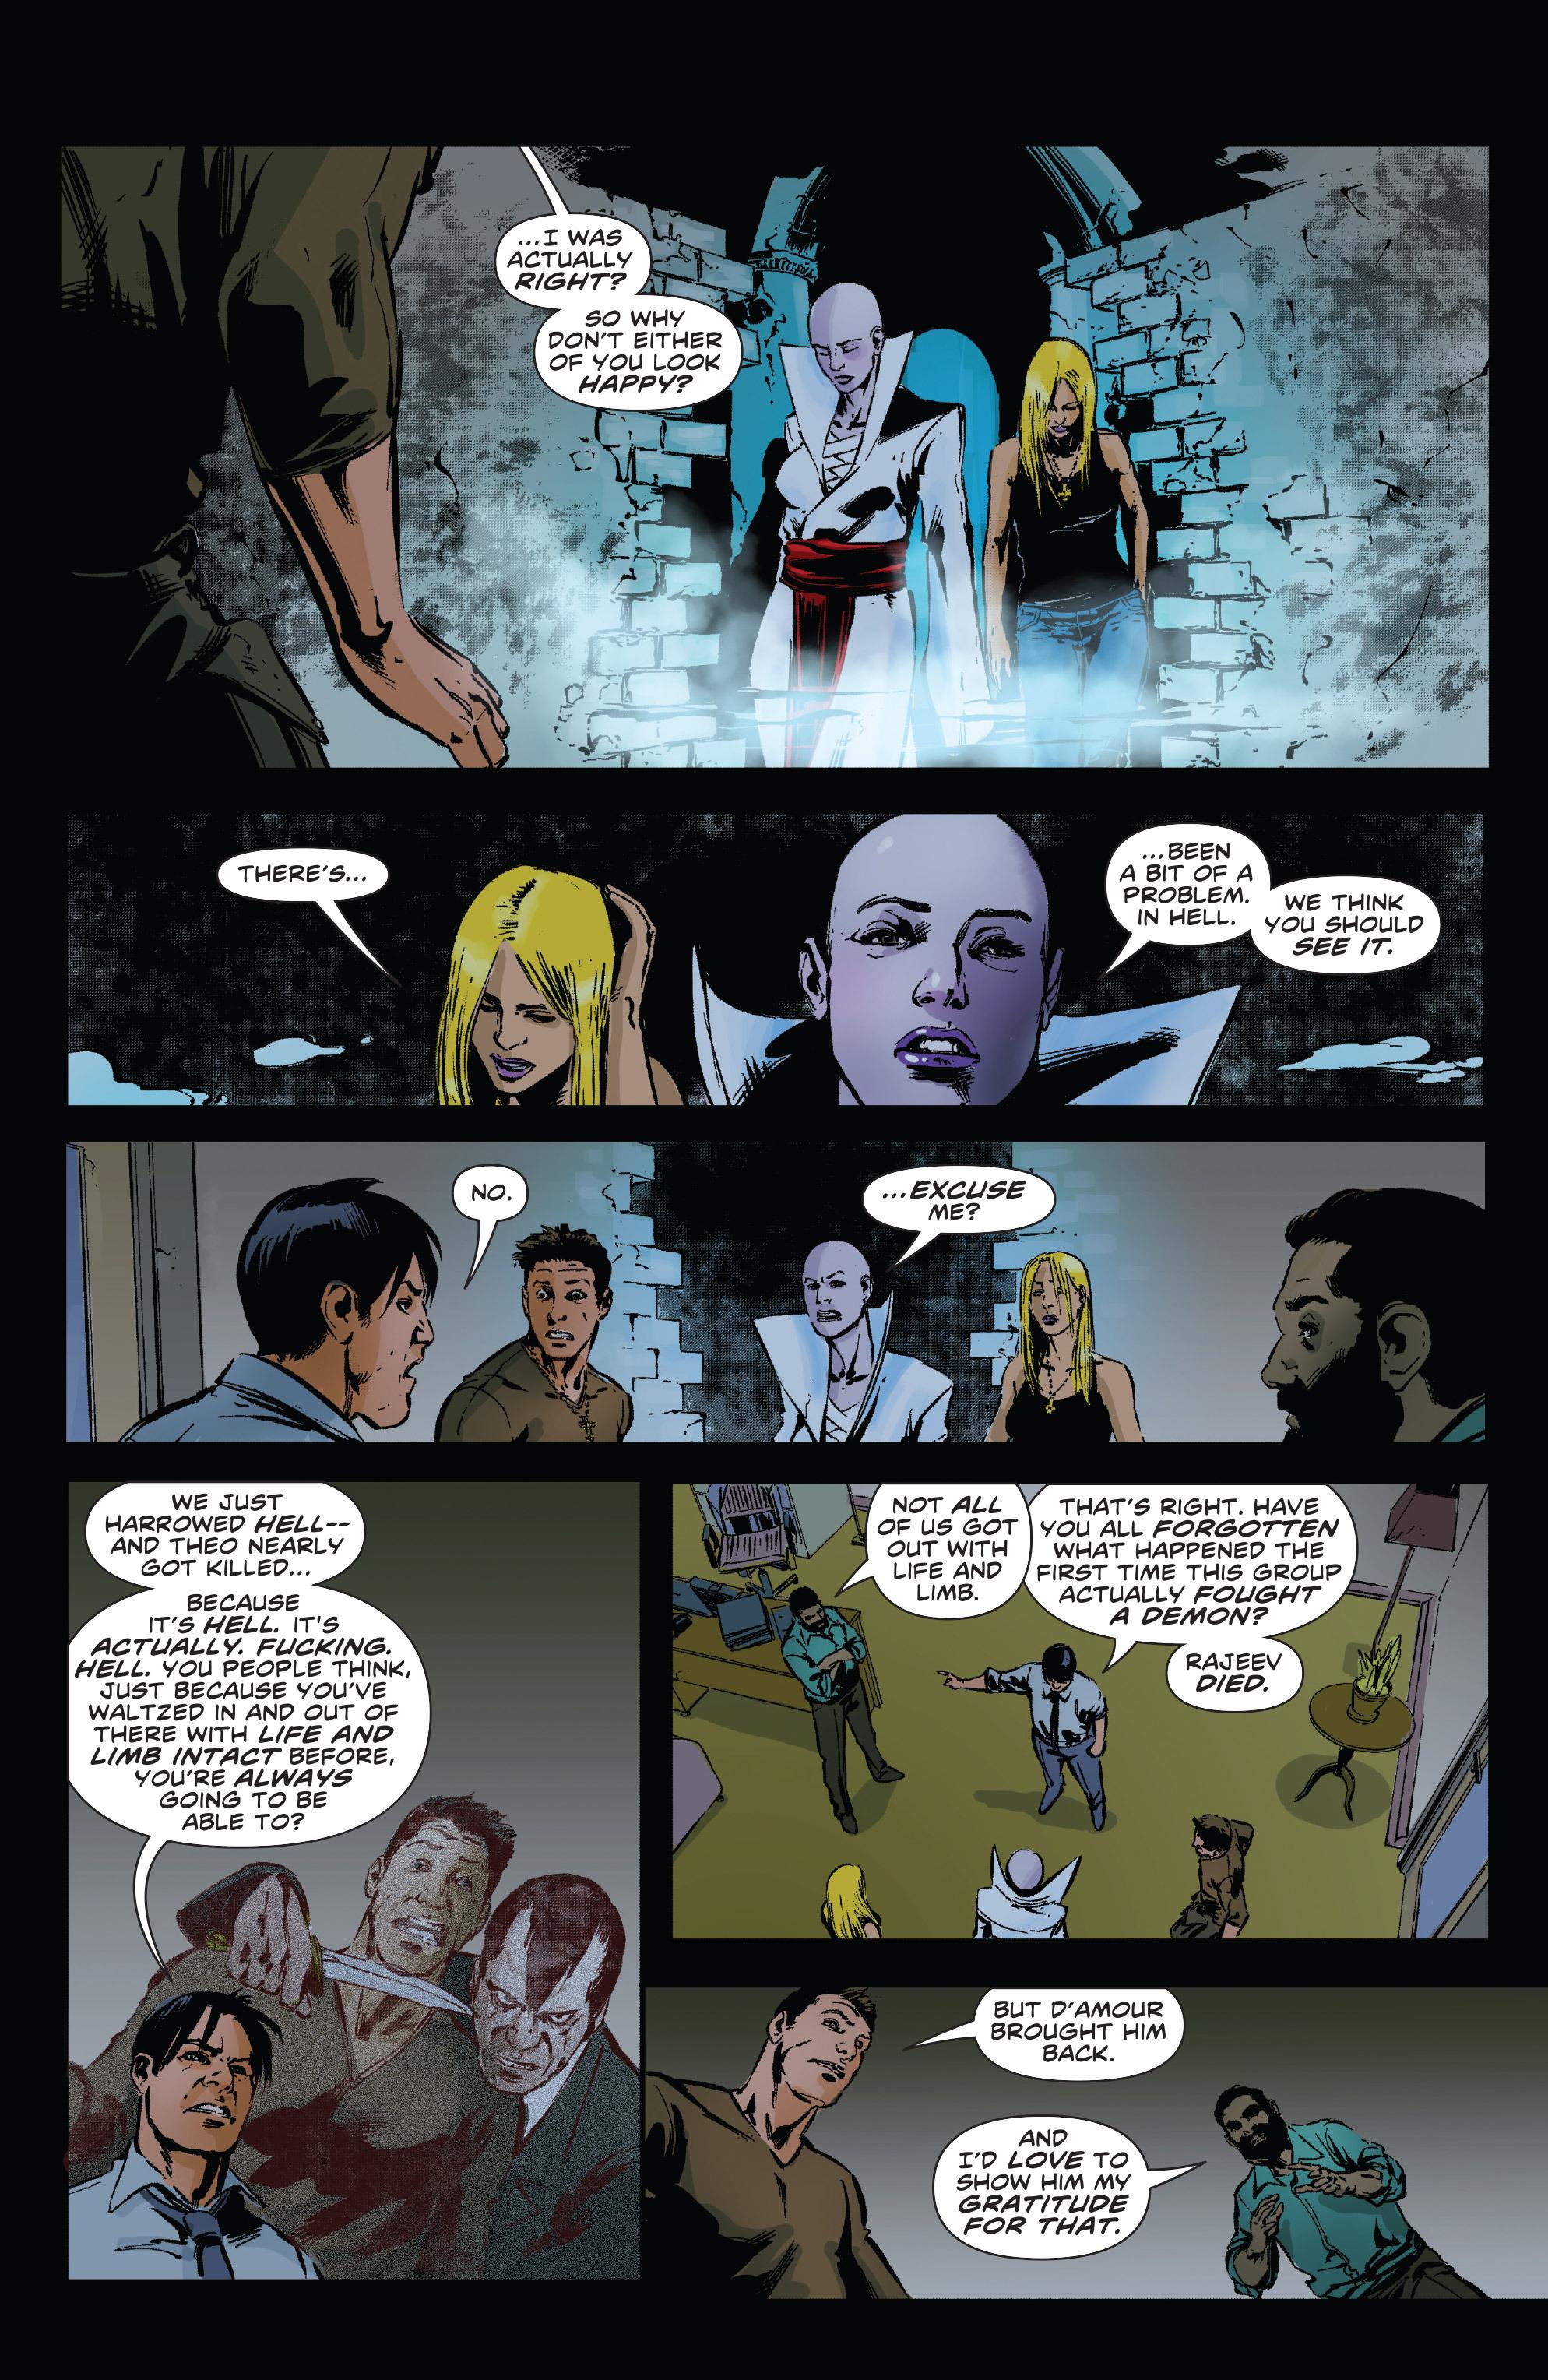 Read online Clive Barker's Hellraiser: The Dark Watch comic -  Issue # TPB 3 - 41